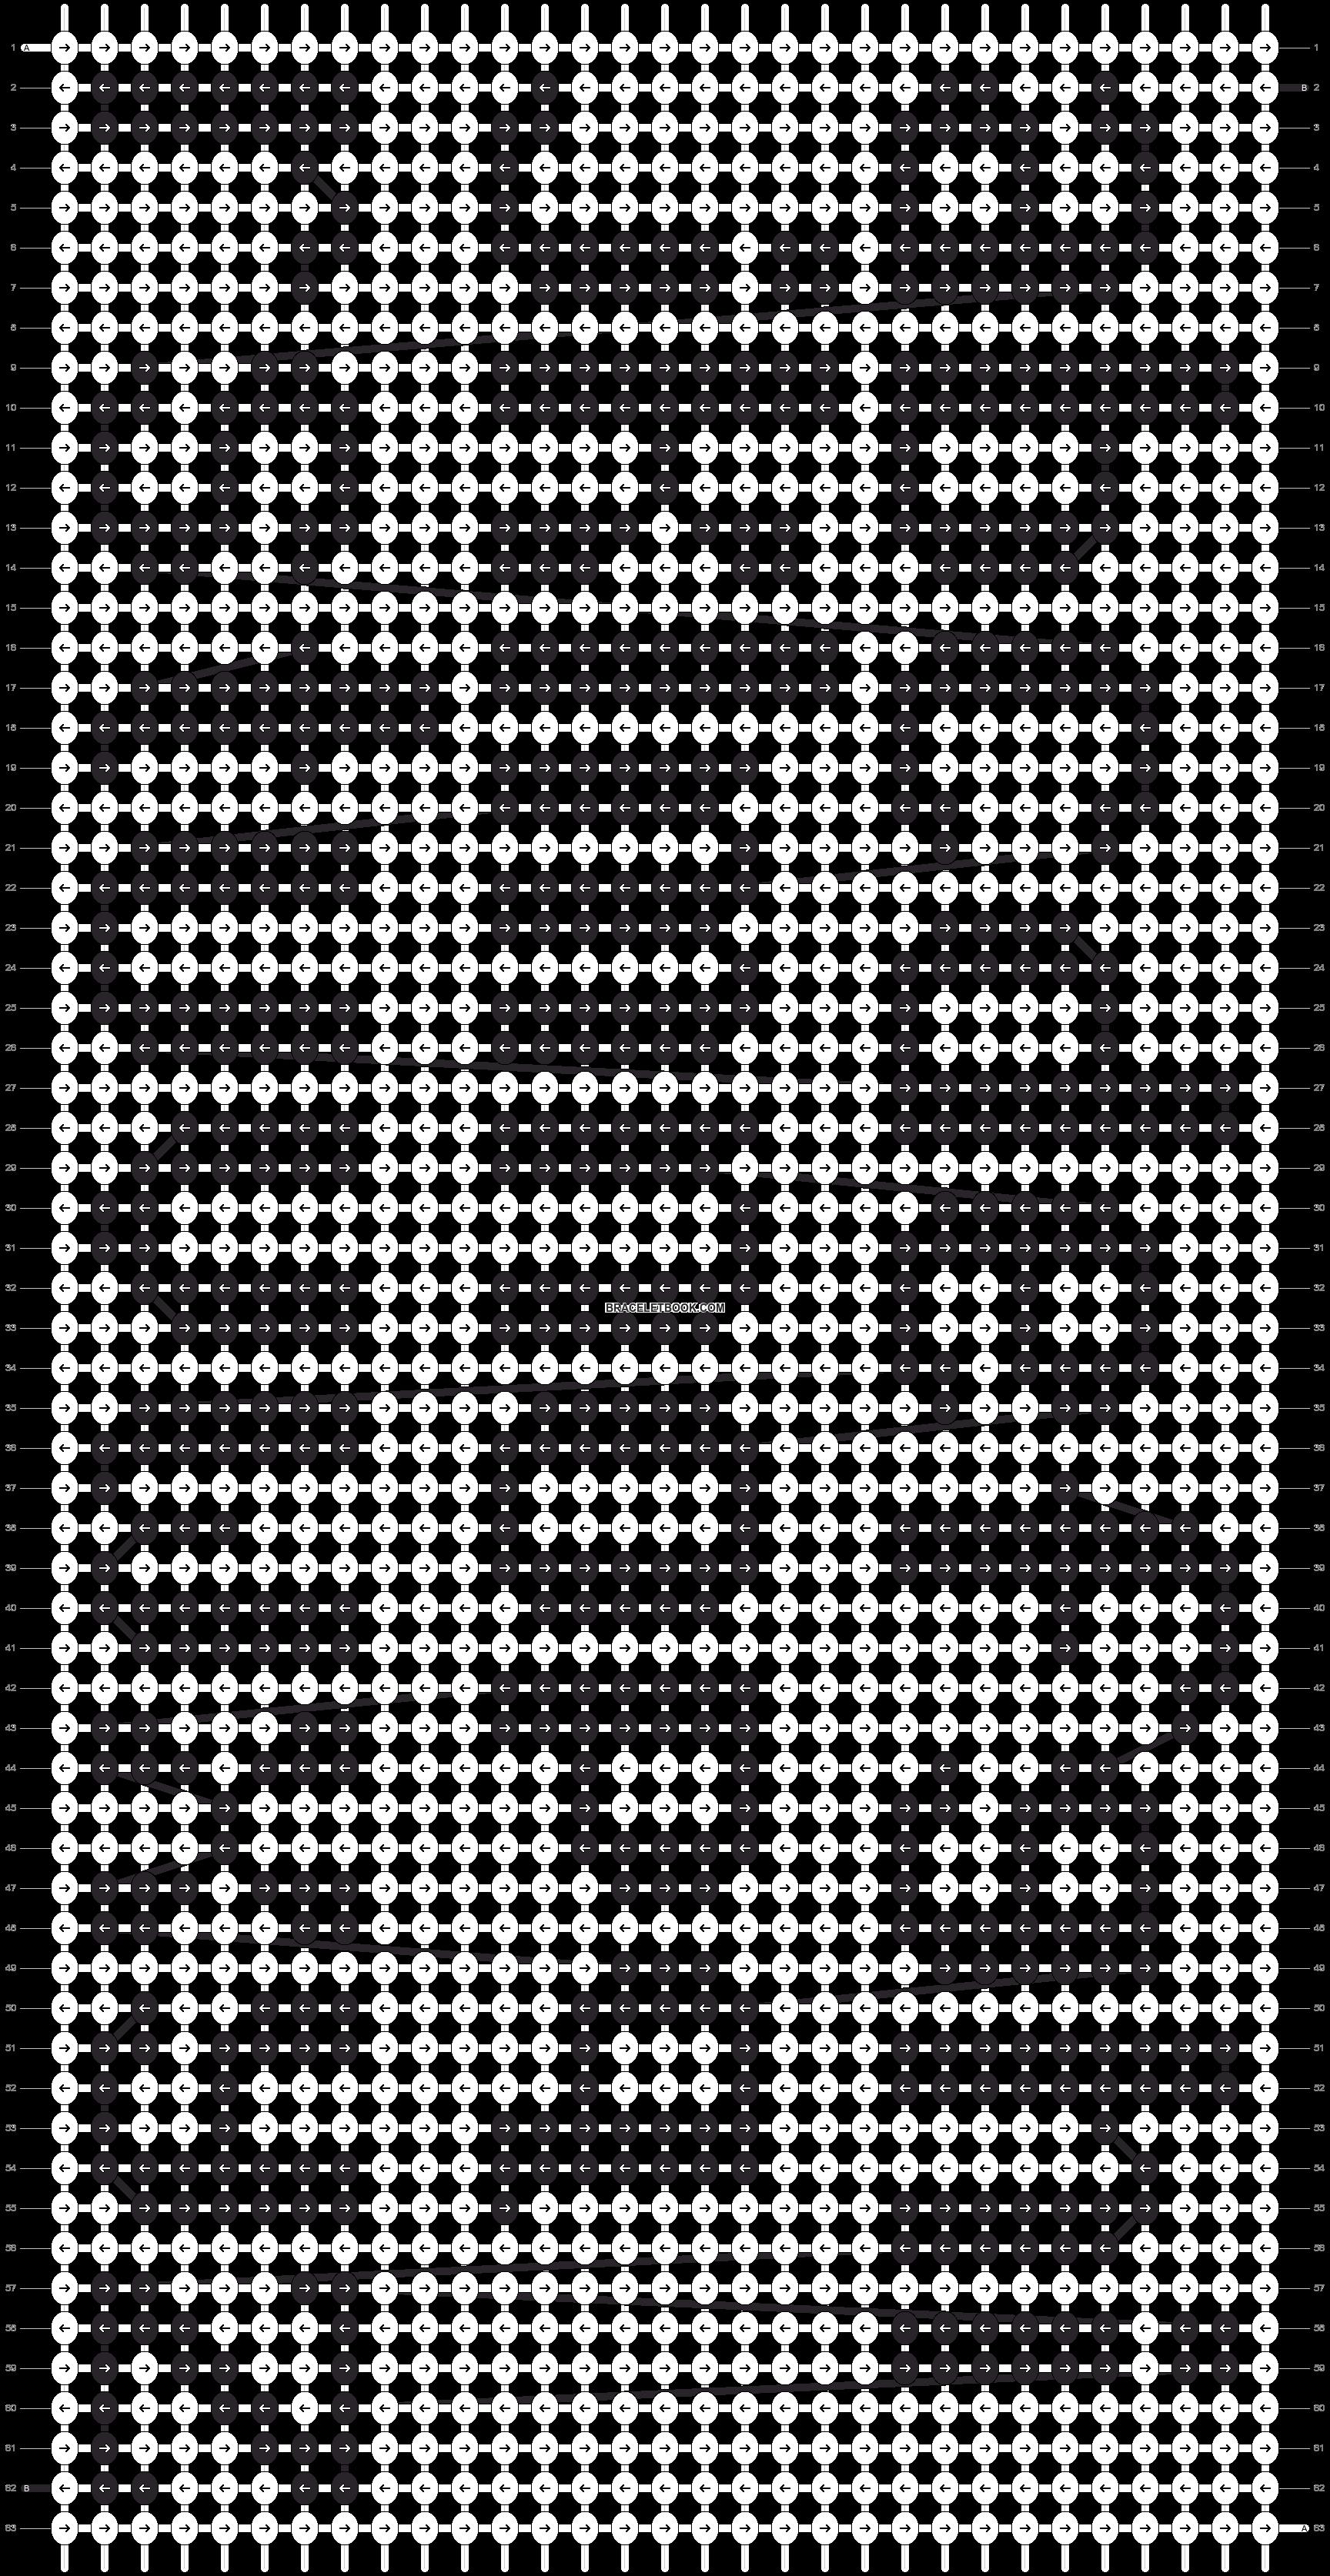 Alpha Pattern #9774 added by CasseroleN